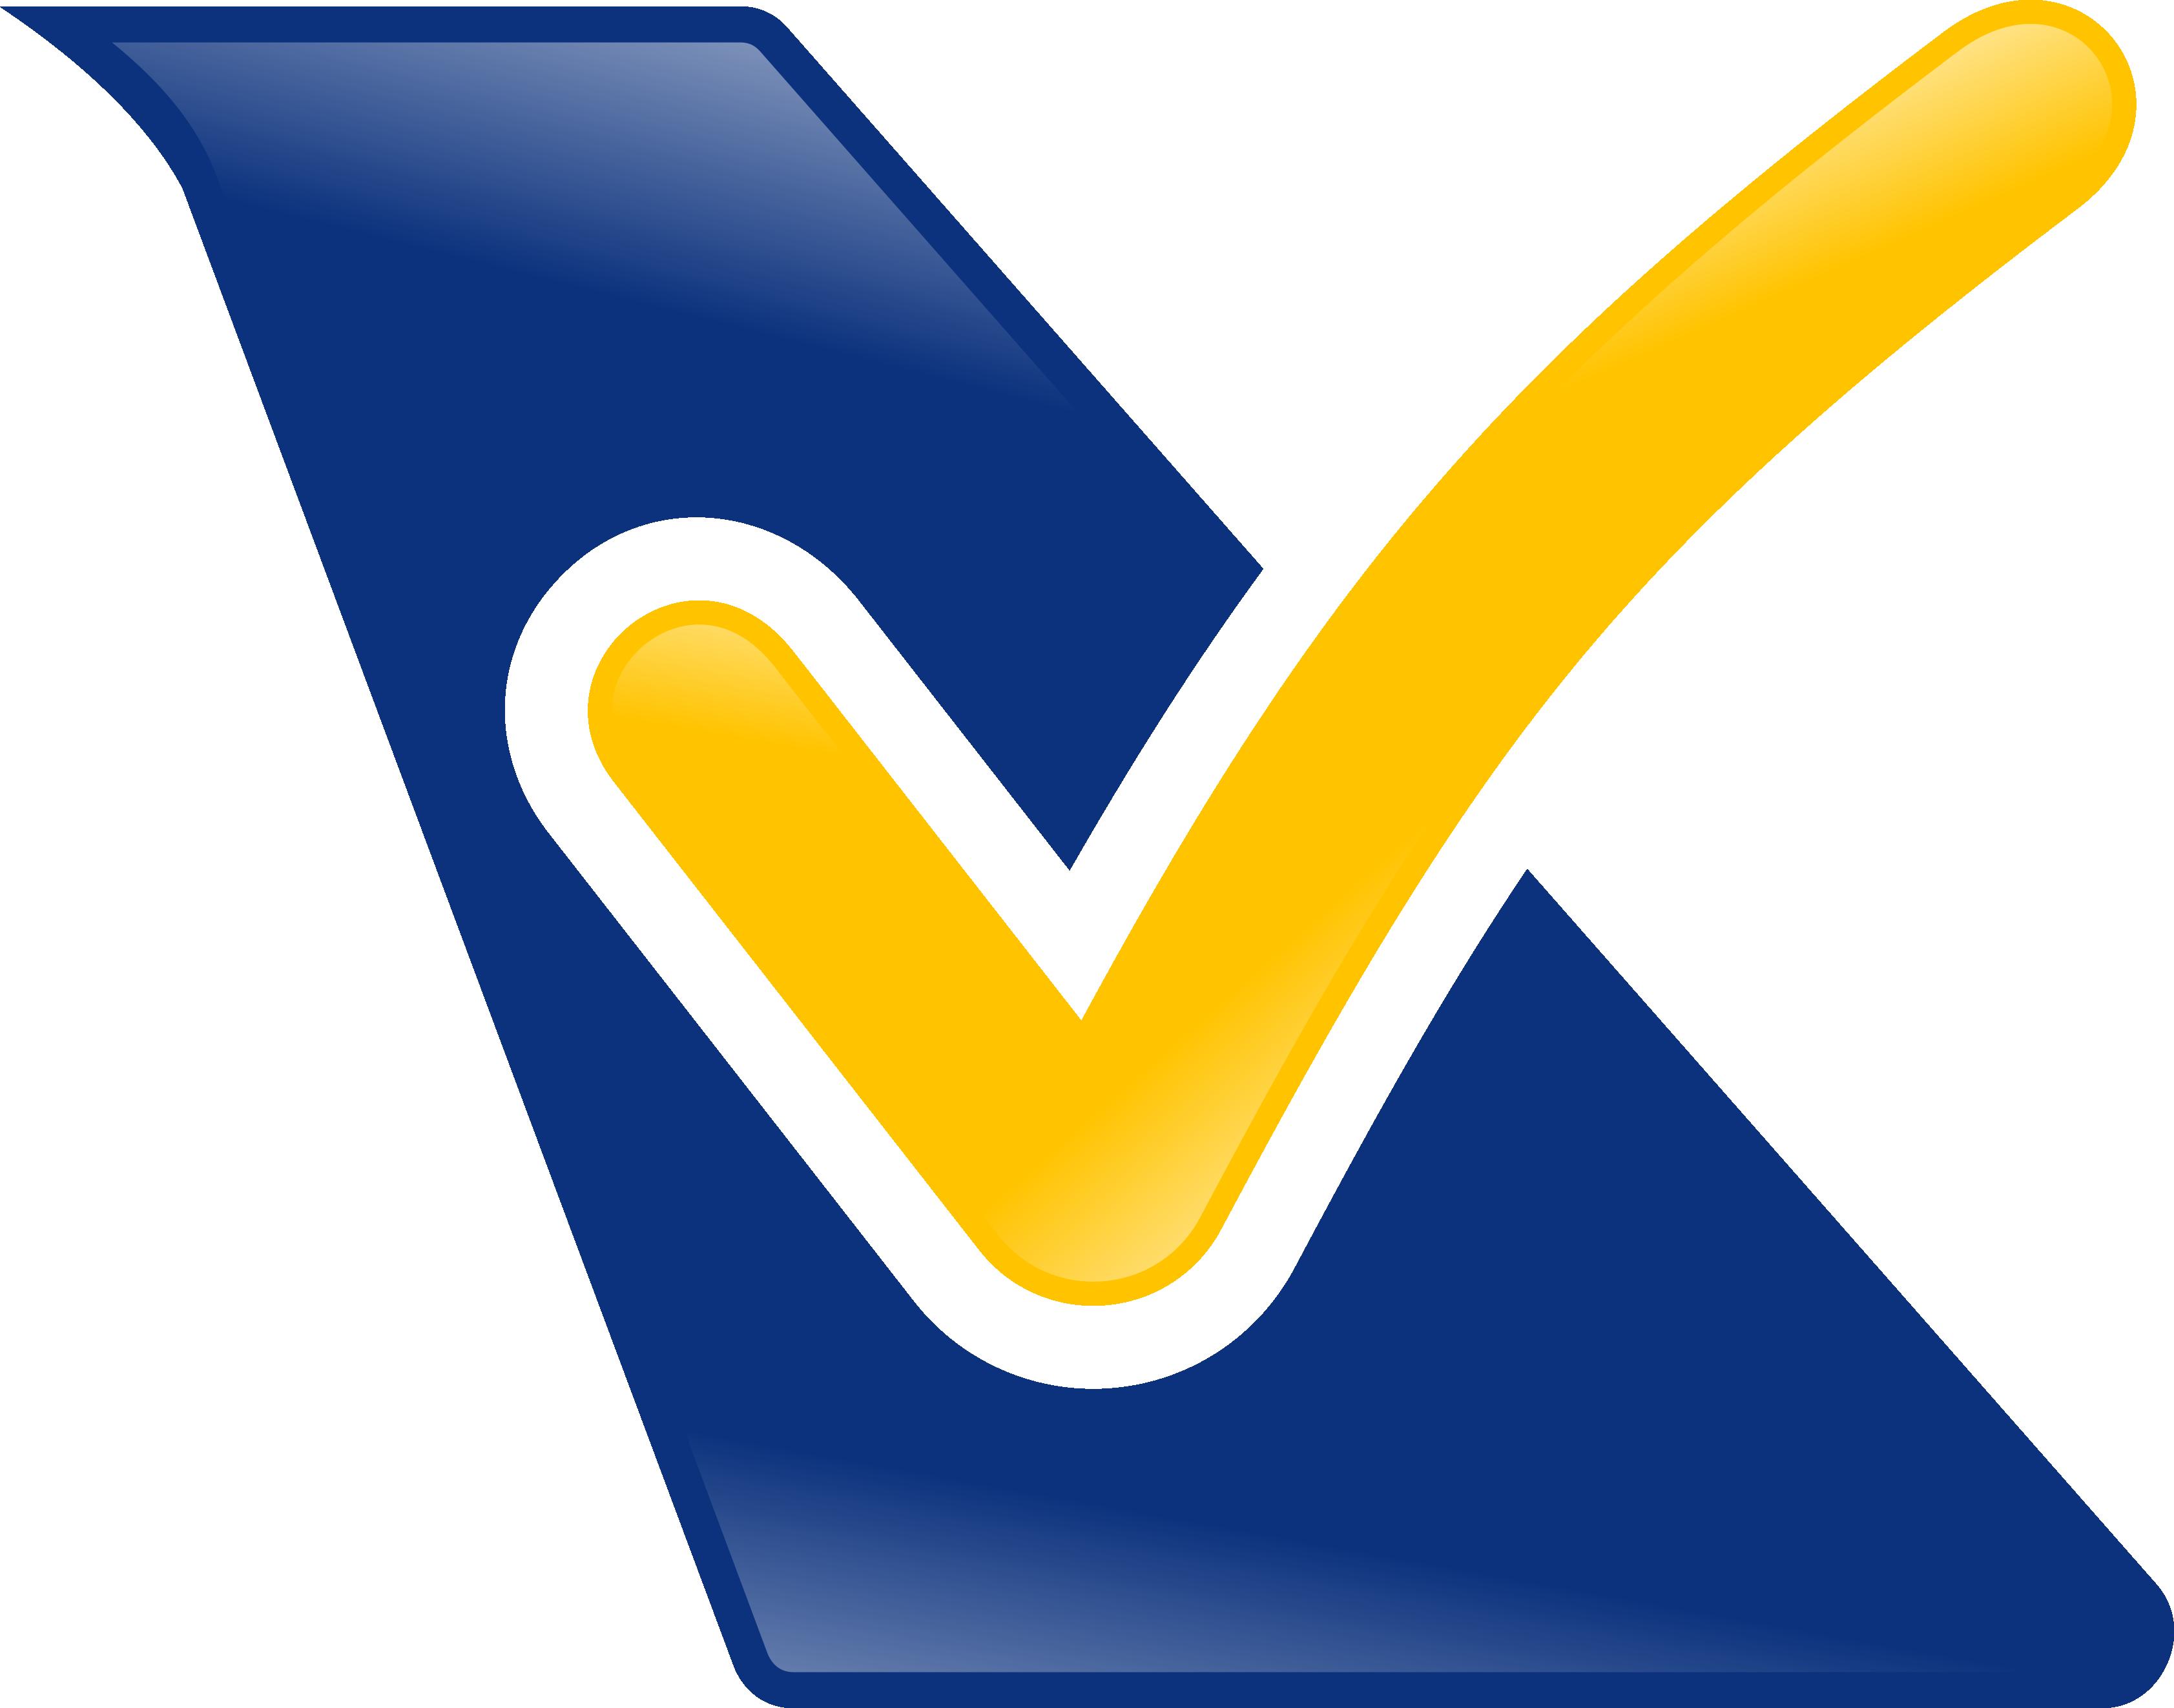 Selo amarelo